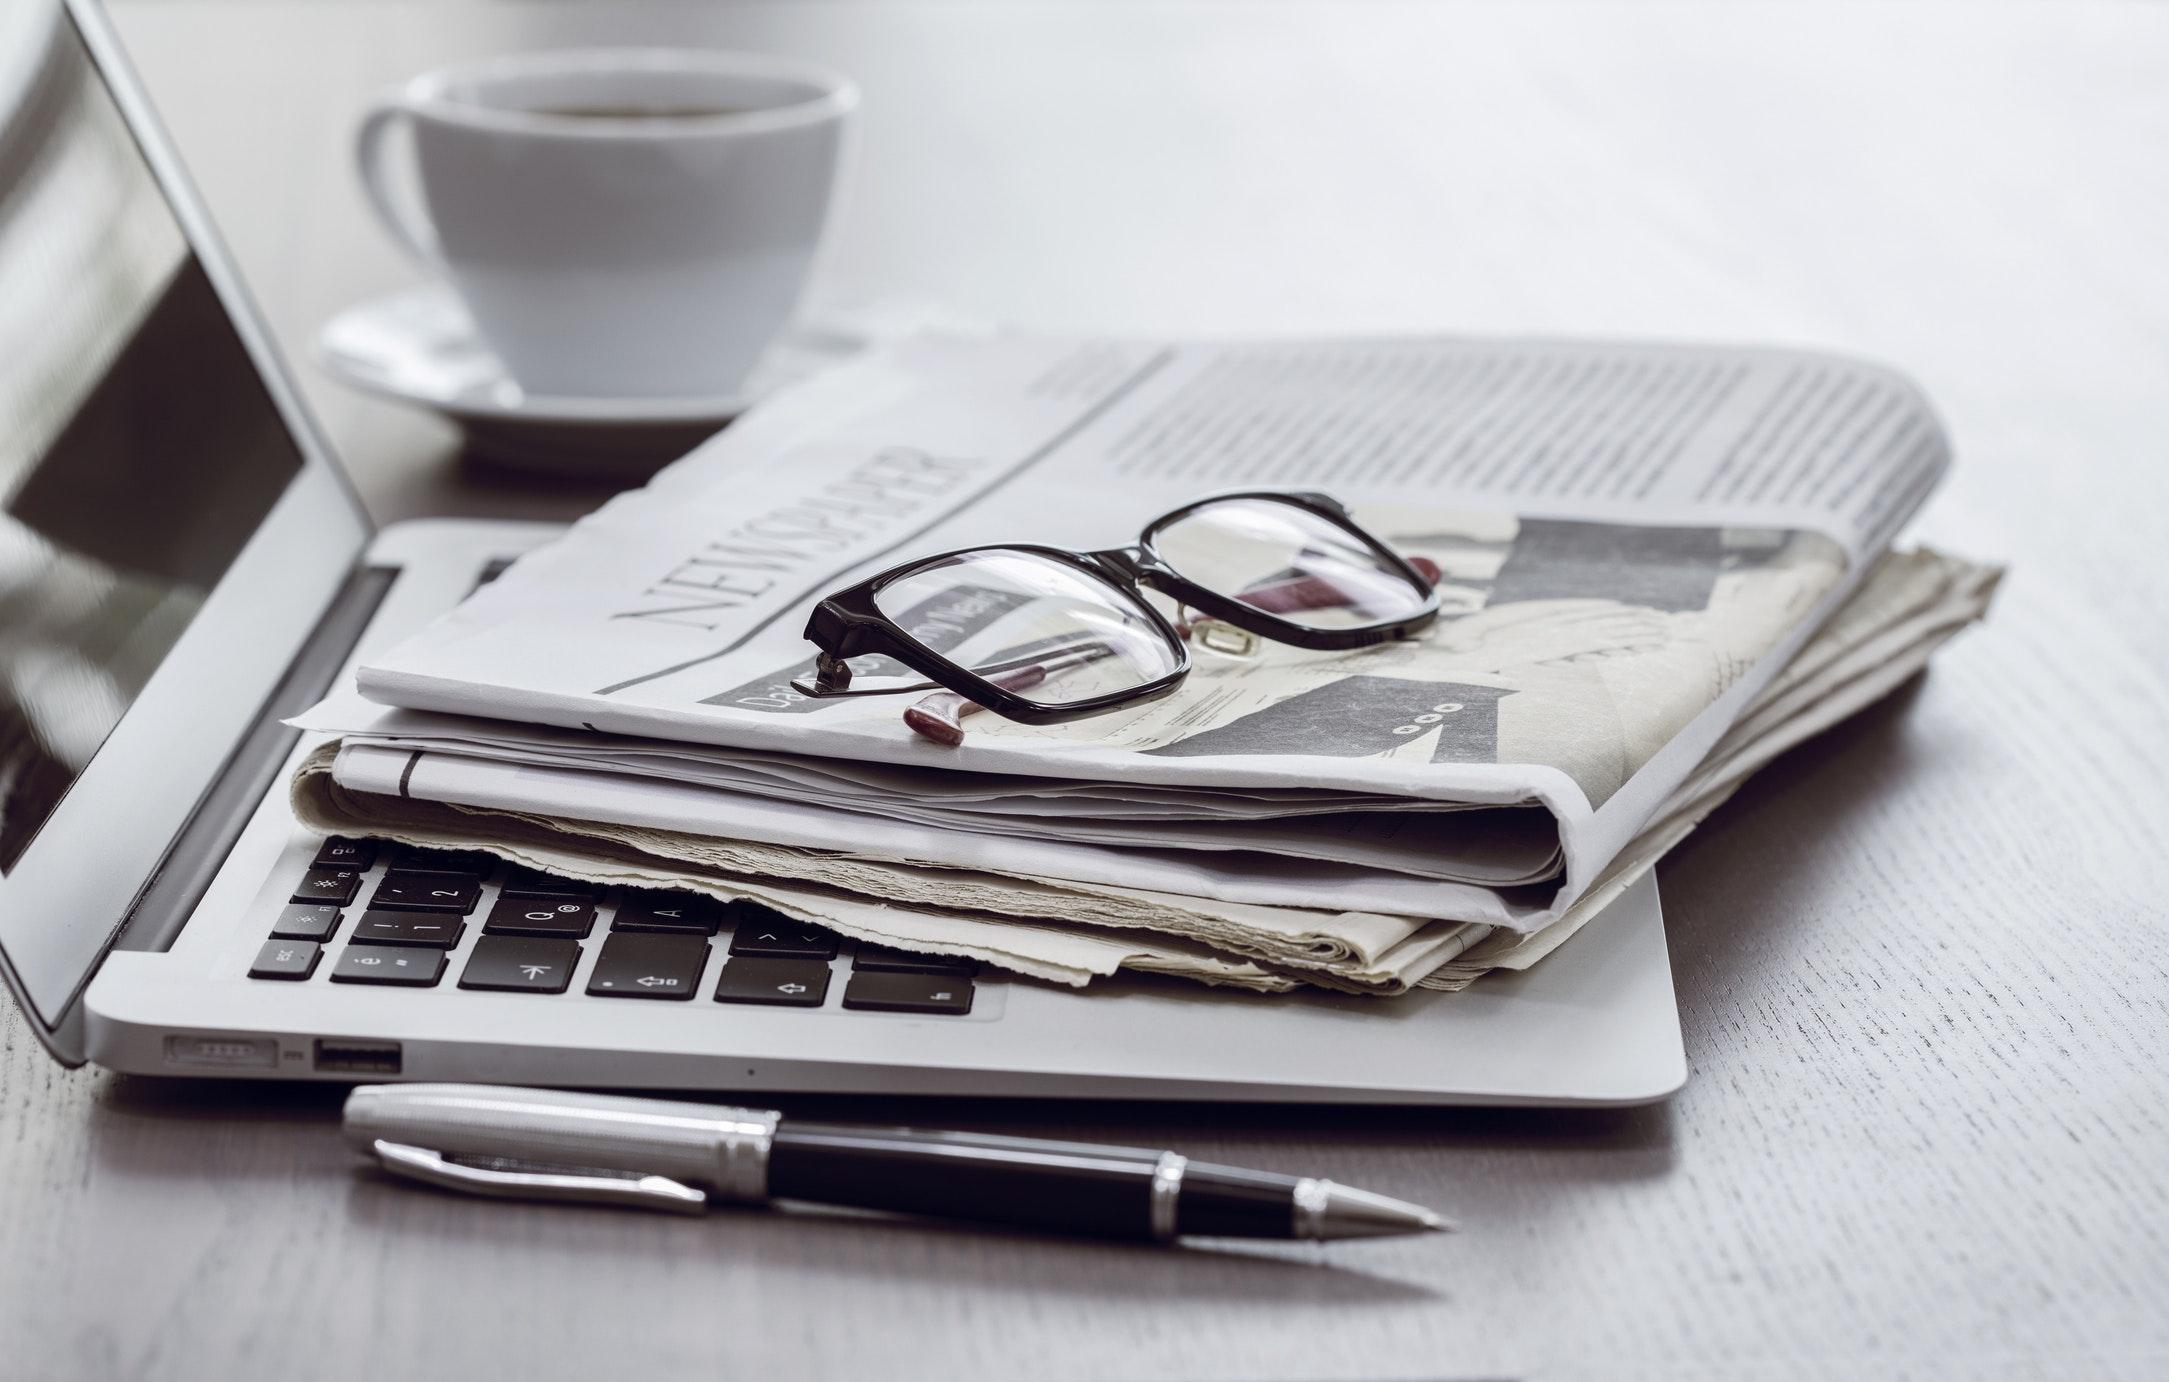 General 2169x1382 newspapers laptop glasses pen